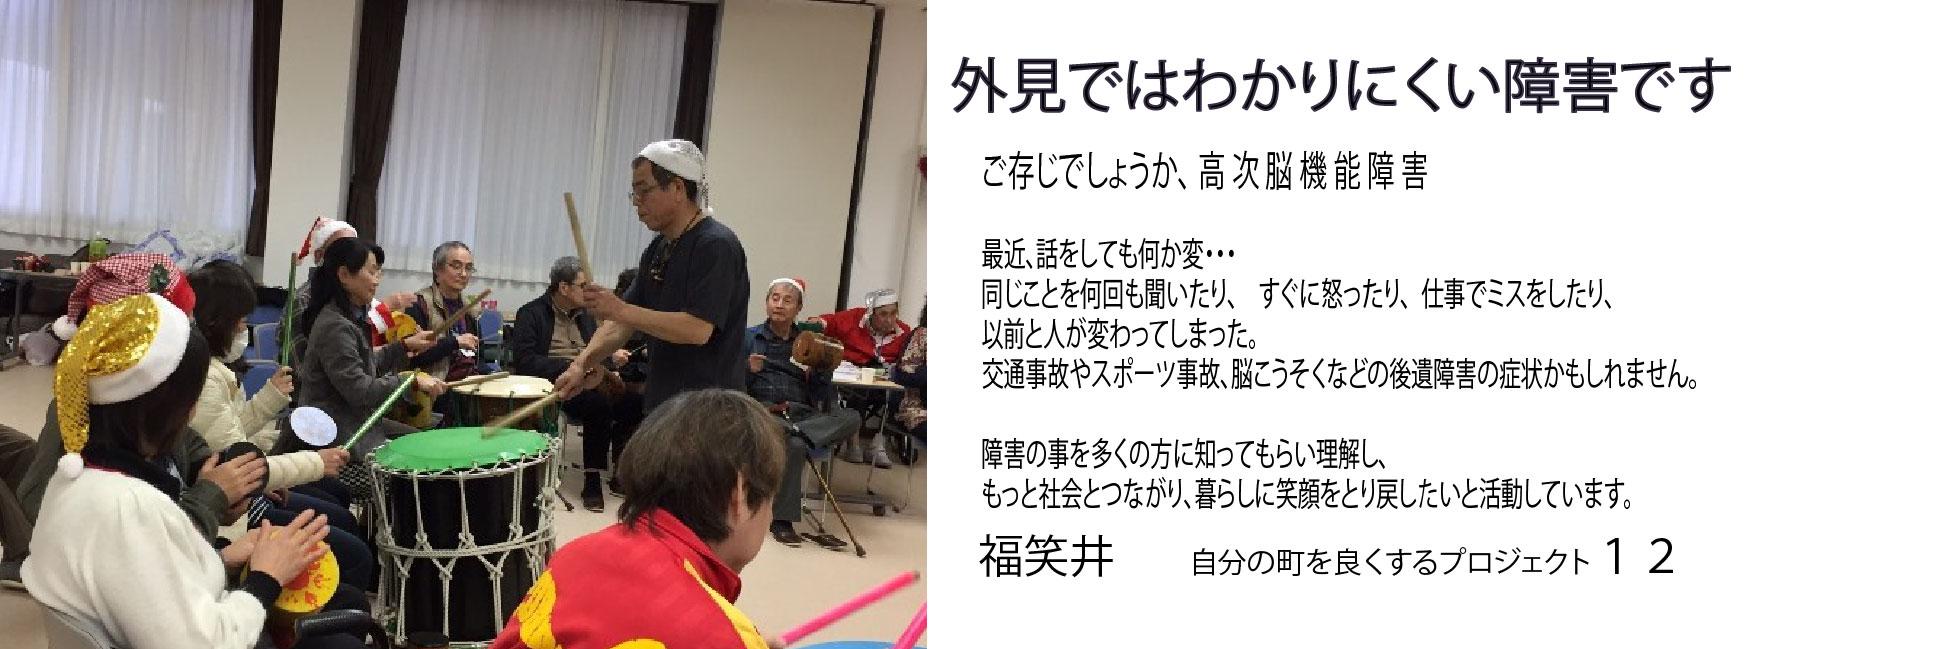 slider_temagatabokin2fukuwarai-01.jpg